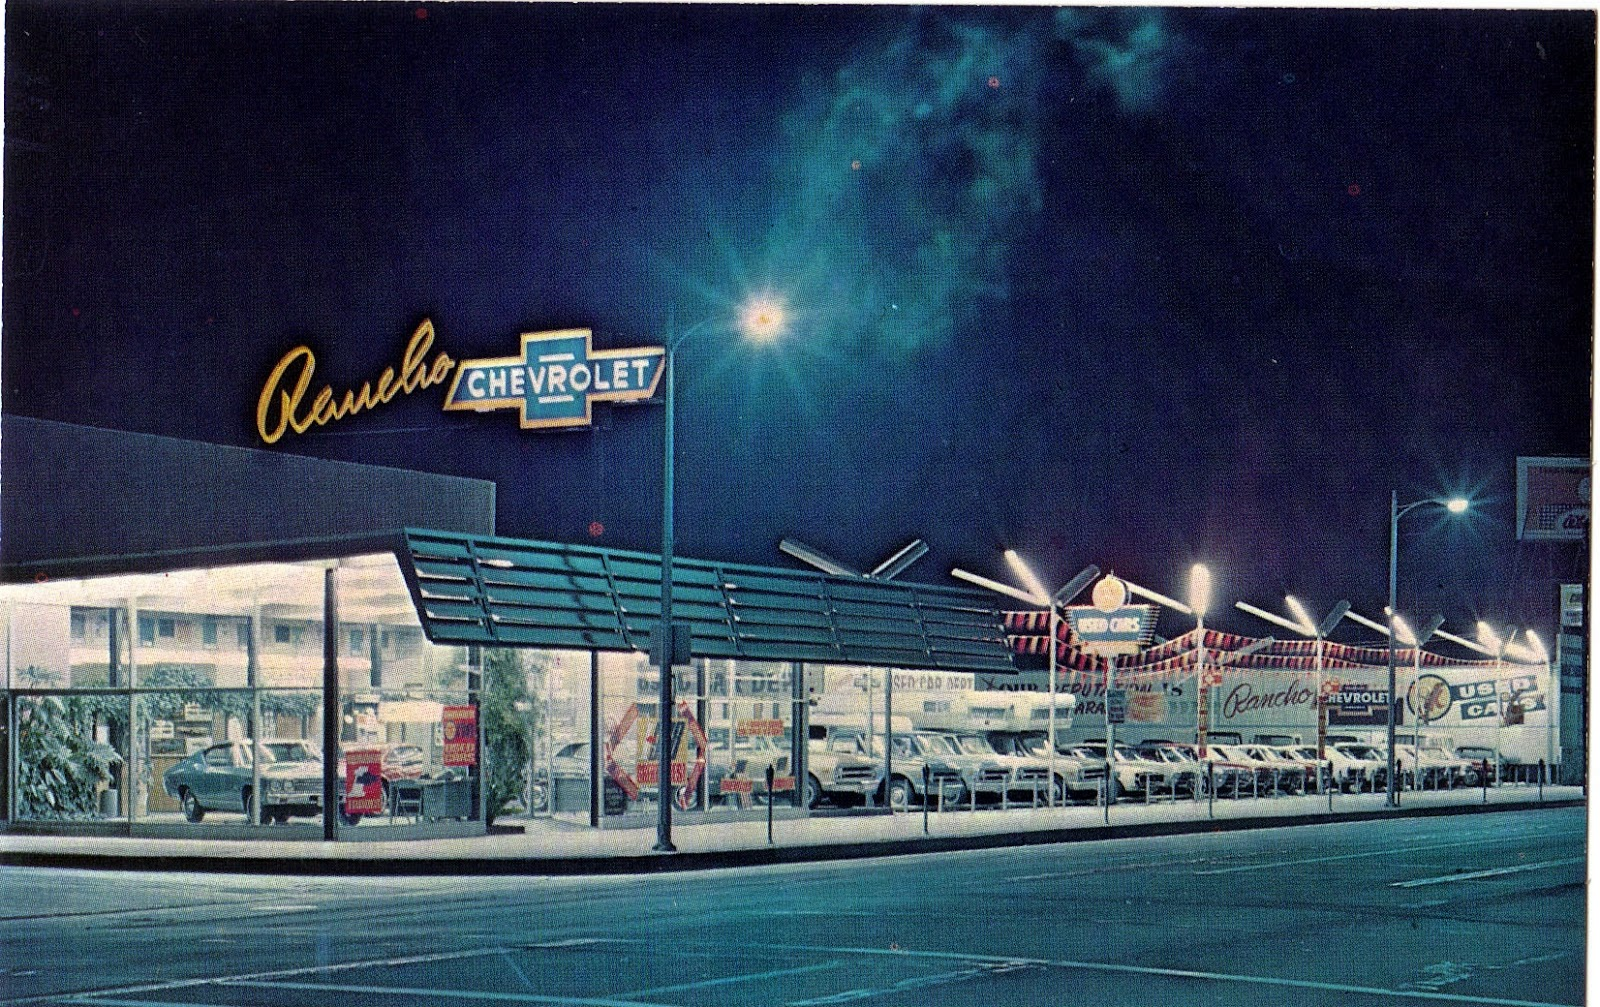 Rancho Chevrolet in Reseda Postcard | San Fernando Valley Blog